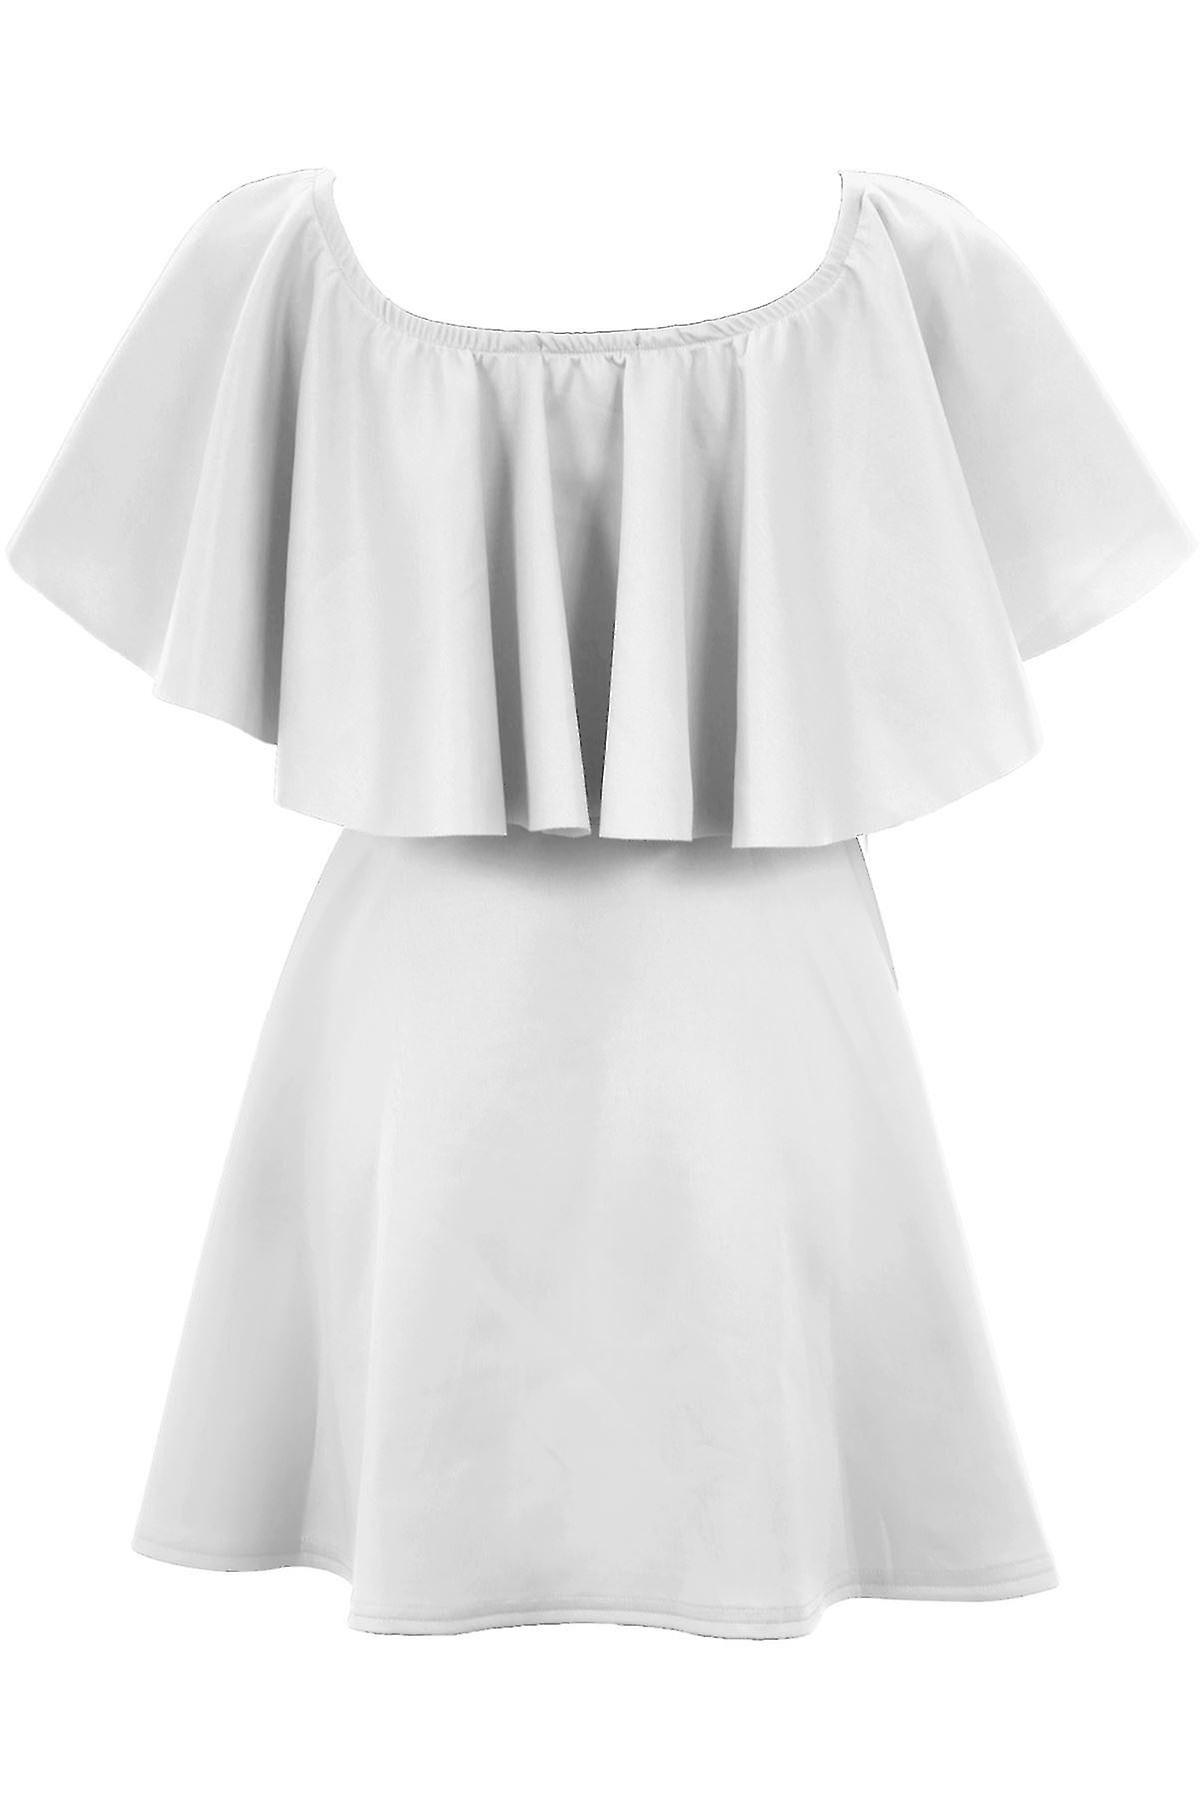 Ladies Celeb Inspired Off Shoulder Frill Women's Flared Summer Swing Short Dress